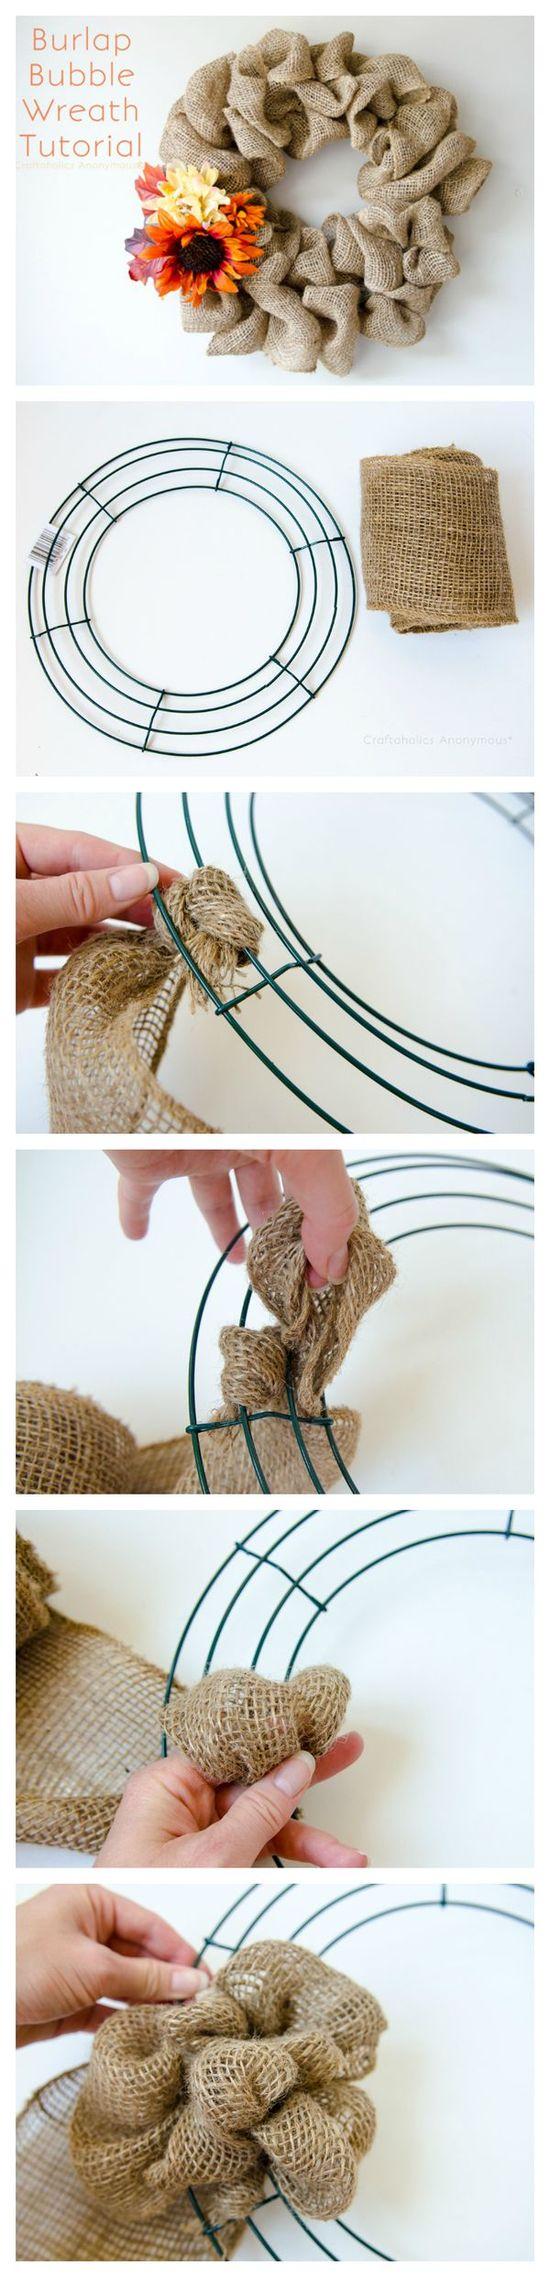 Easy DIY Burlap Wrea